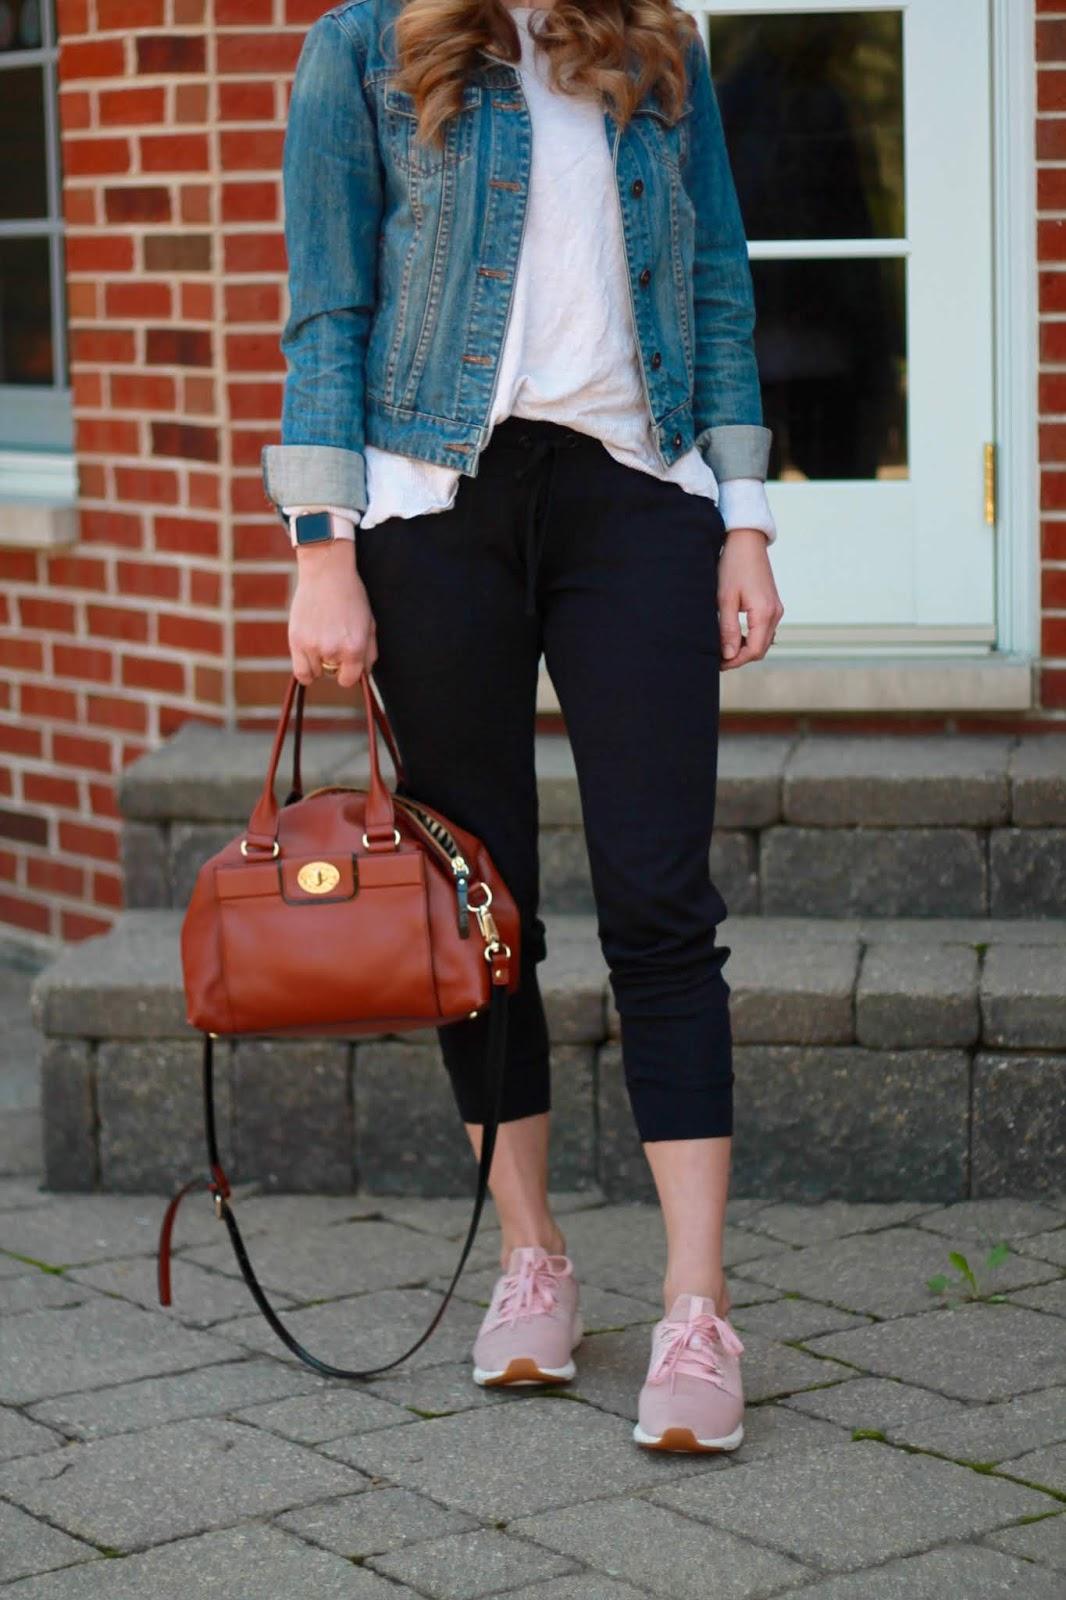 ABEO everett shoes, blush tennis shoes, joggers, striped dress, olive utility vest, striped midi skirt